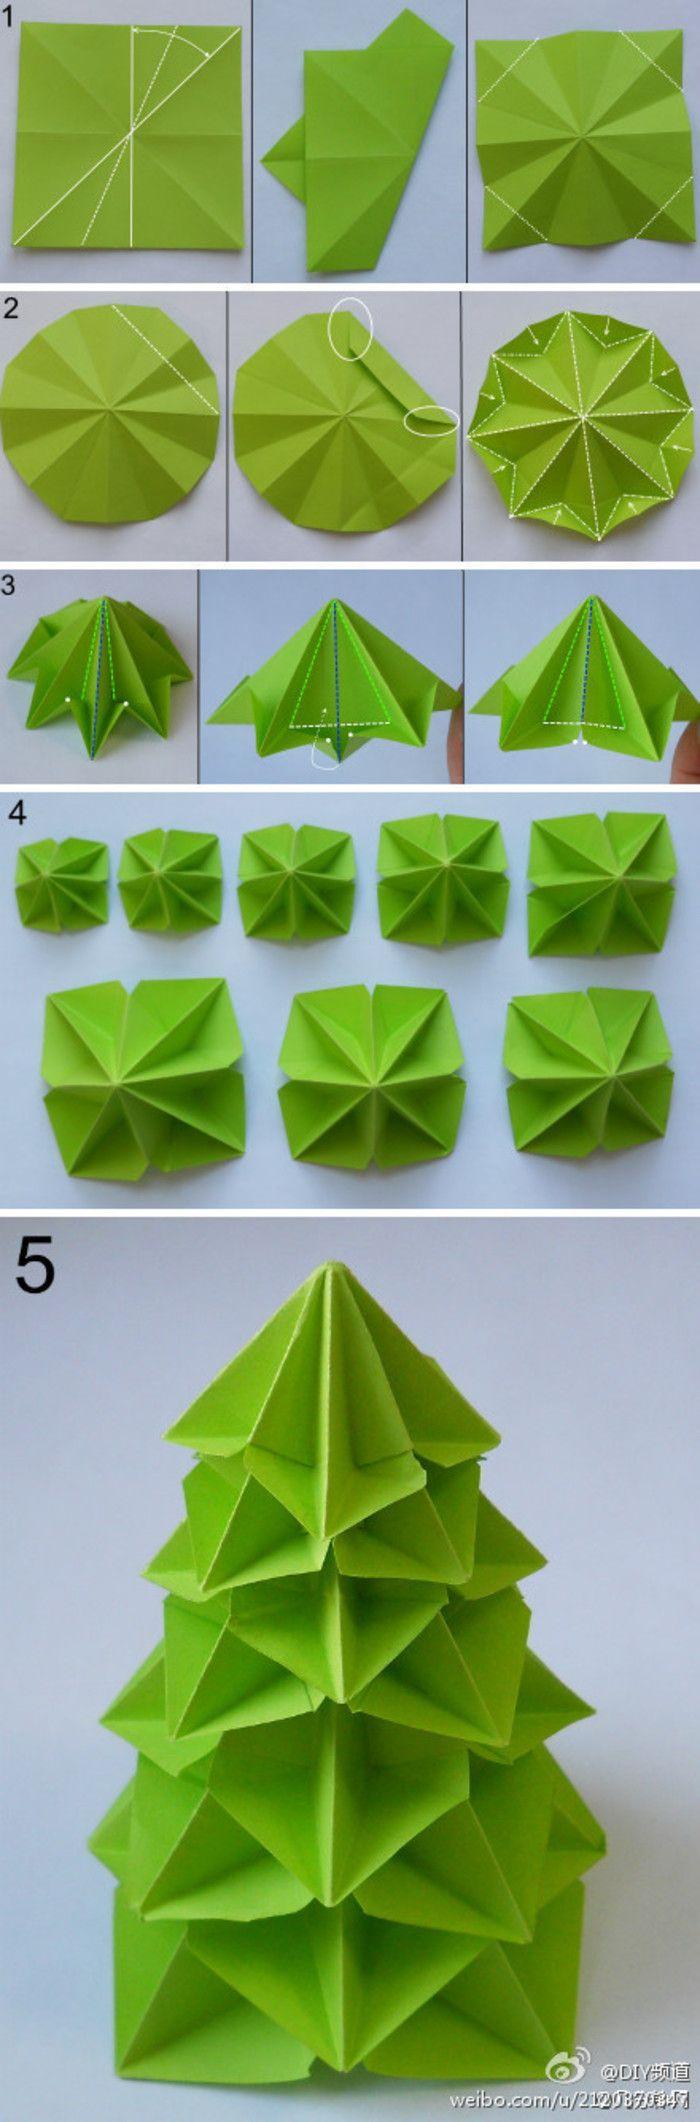 Origami Christmas Trees | 2122x700